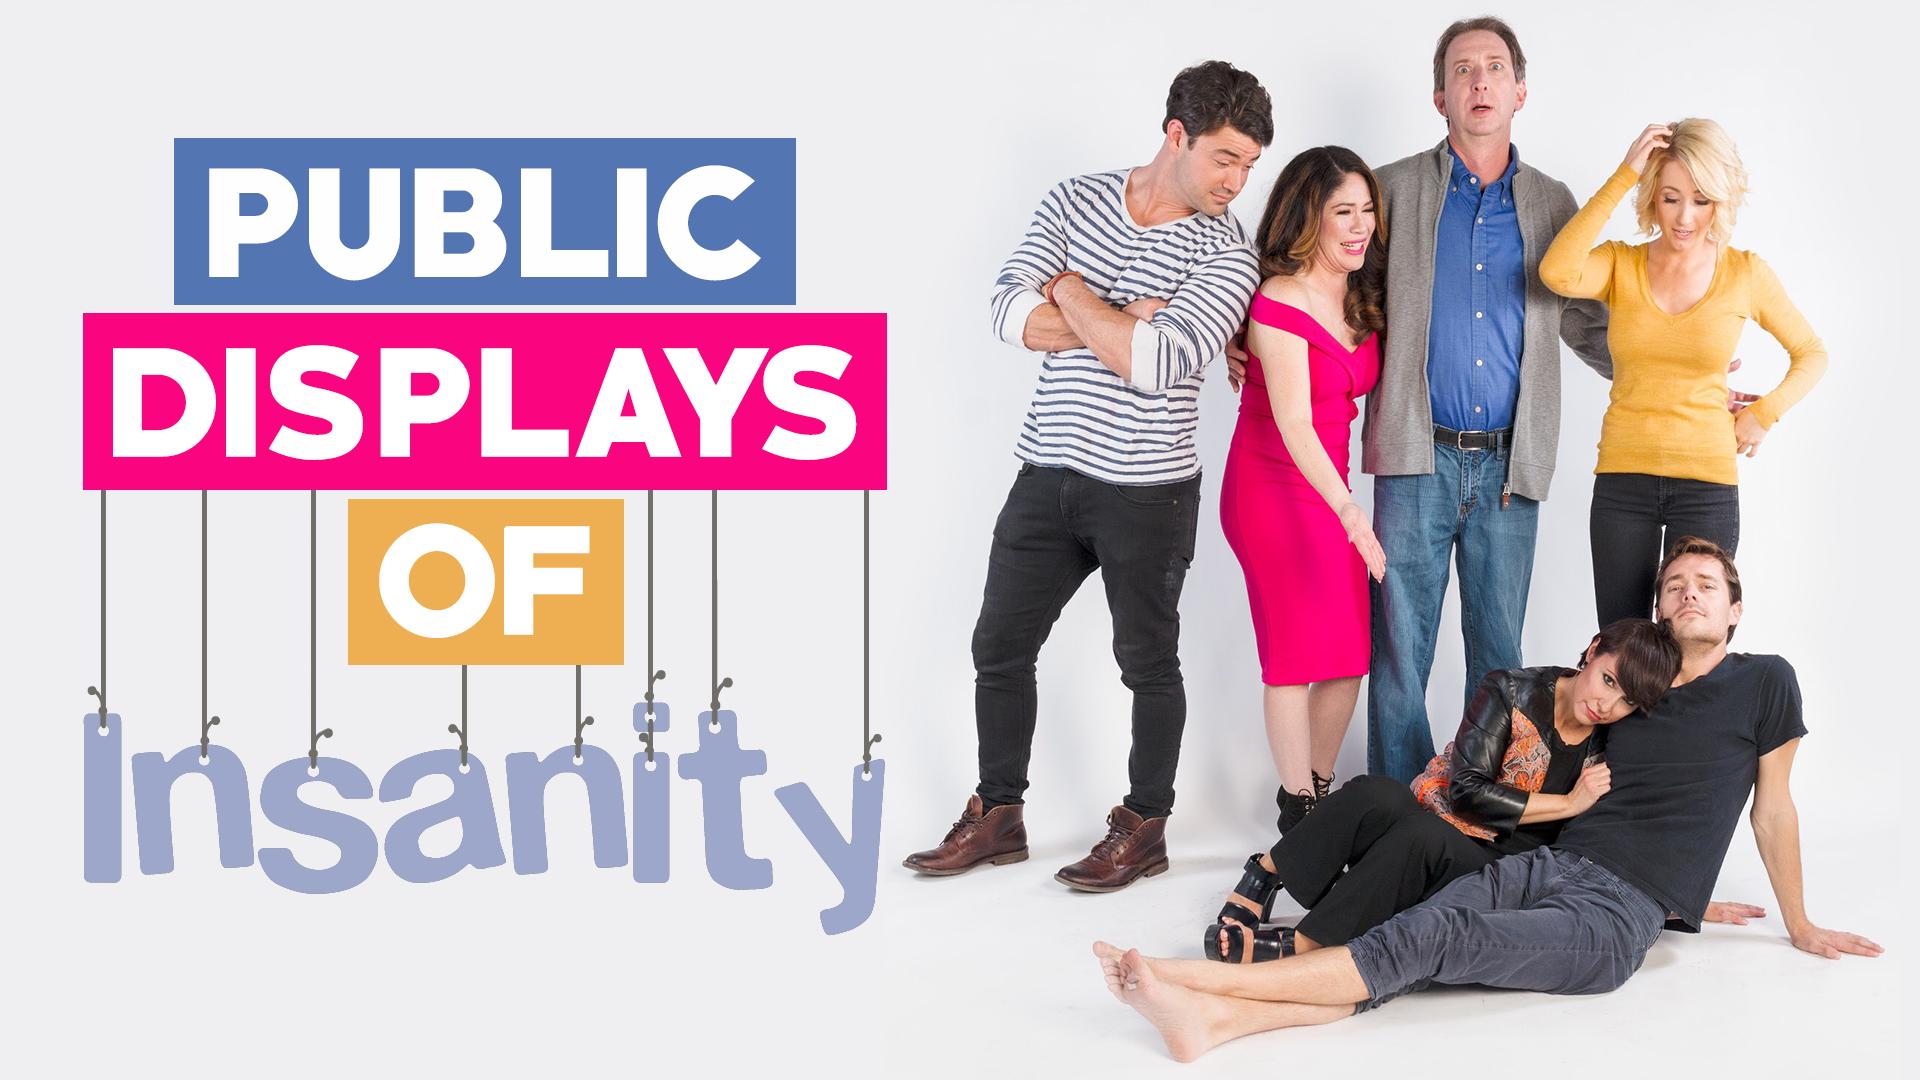 Public Displays of Insanity